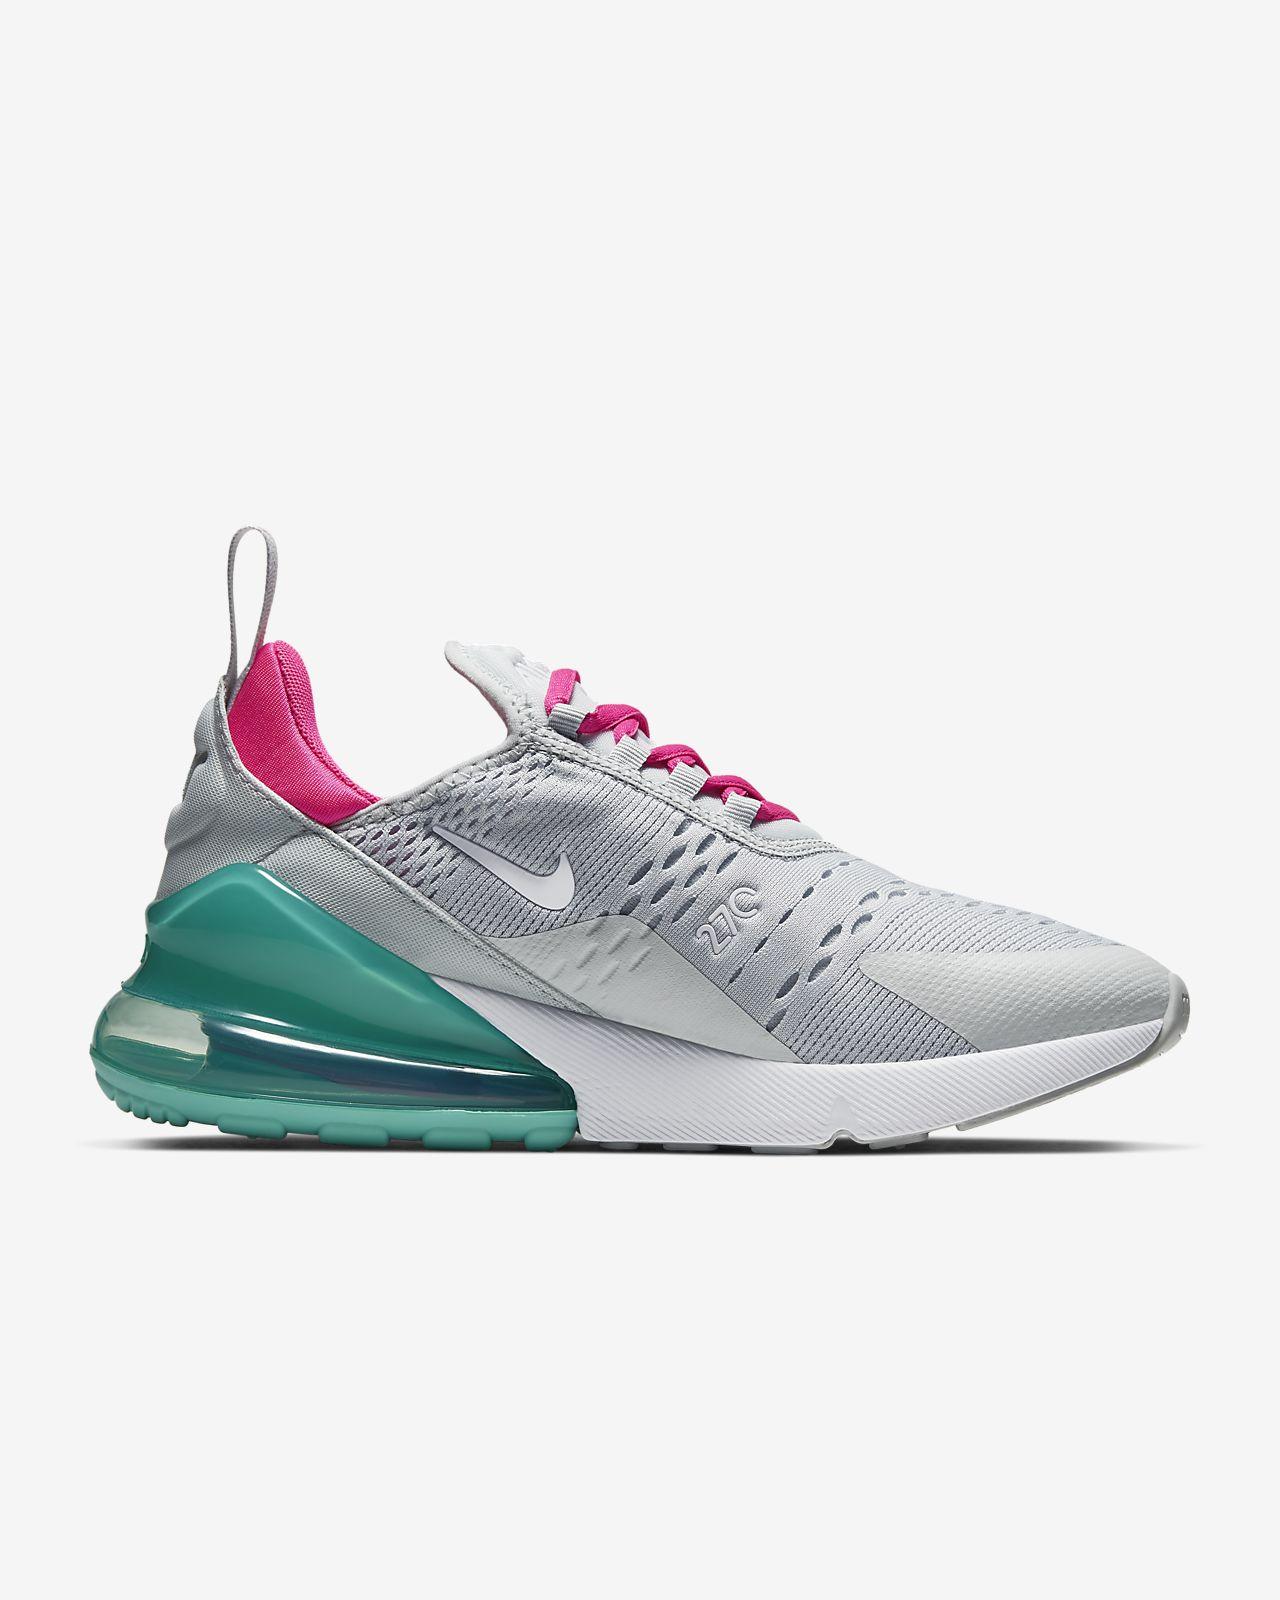 Großhandel Nike Air Max 270 Shoes 2019 Cushion Running